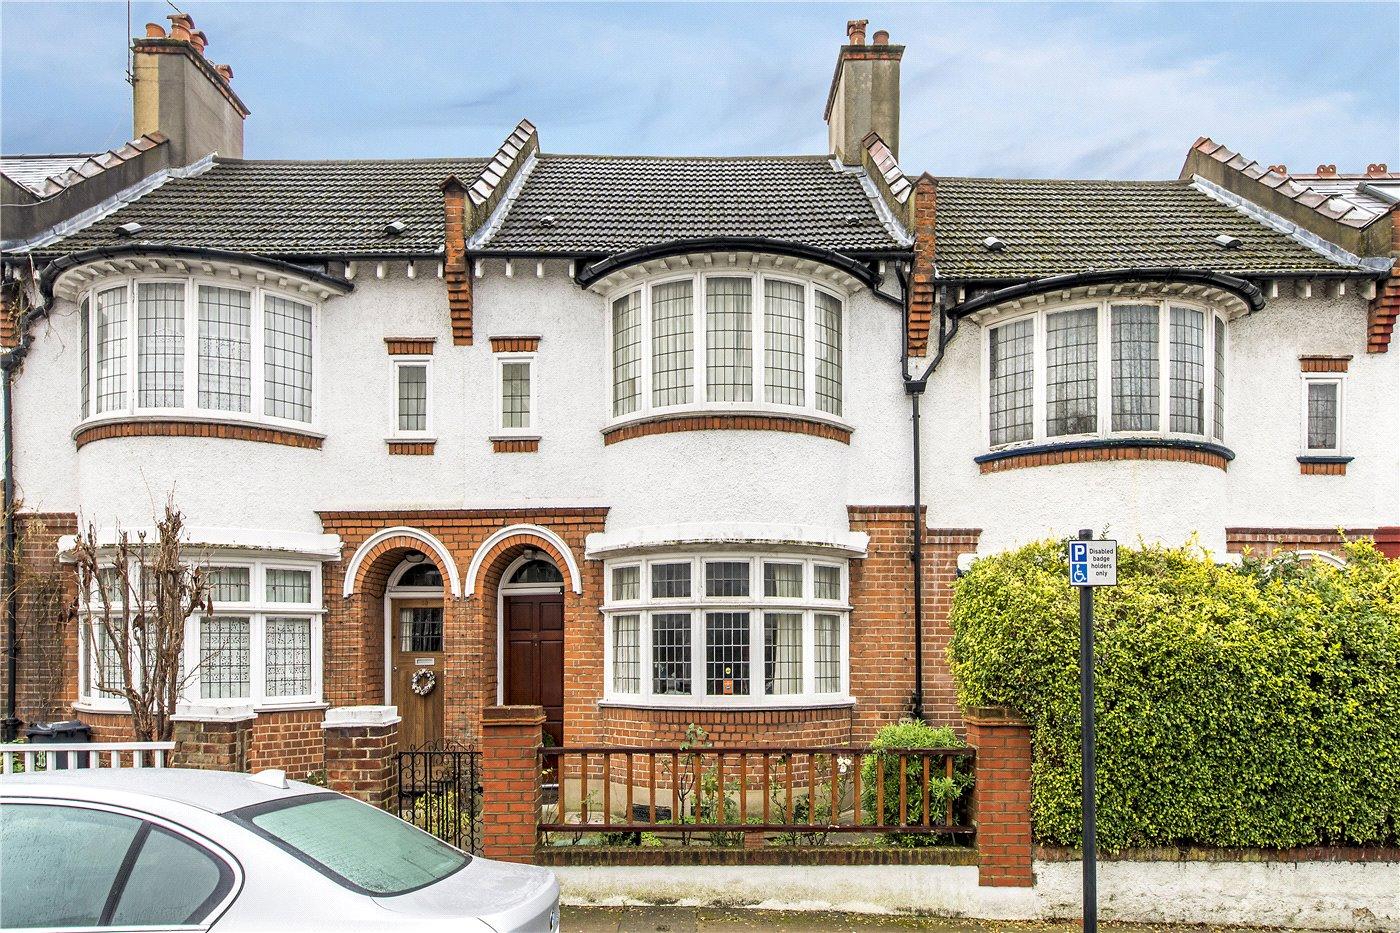 3 Bedroom Property For Sale In Wyatt Park Road London SW2